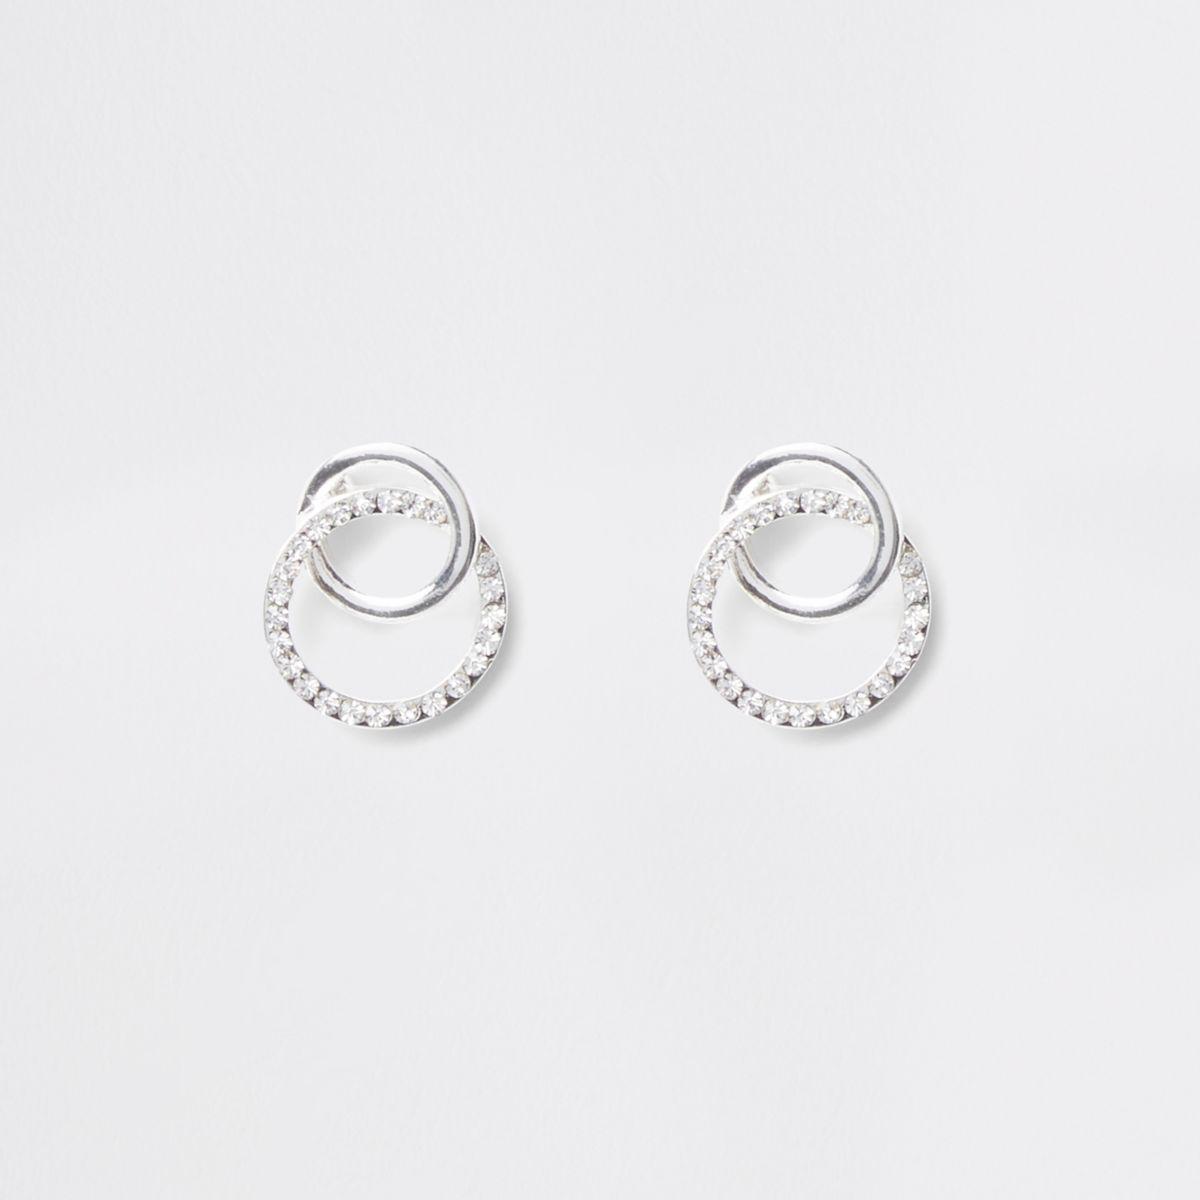 Silver tone diamante interlink circle studs